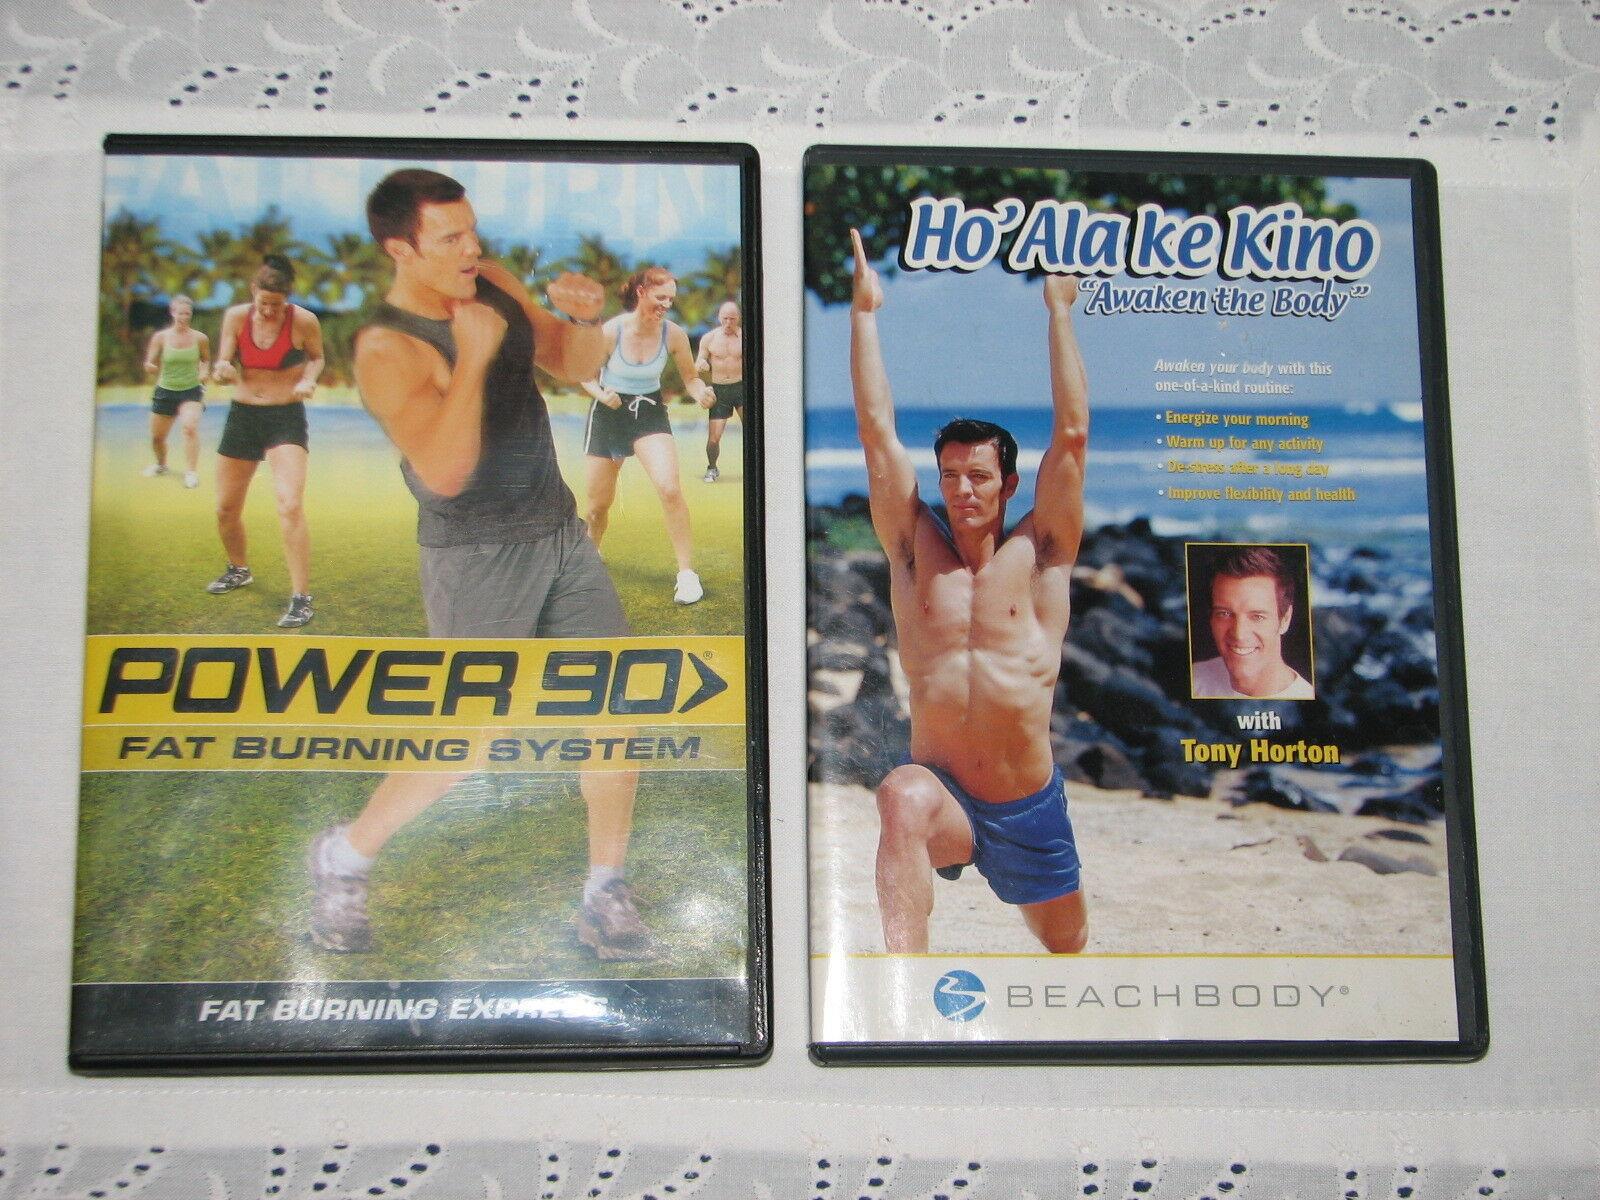 Two Tony Horton DVD's POWER 90 FAT BURNING SYSTEM HO'ALAKE KINO AWAKEN THE BODY